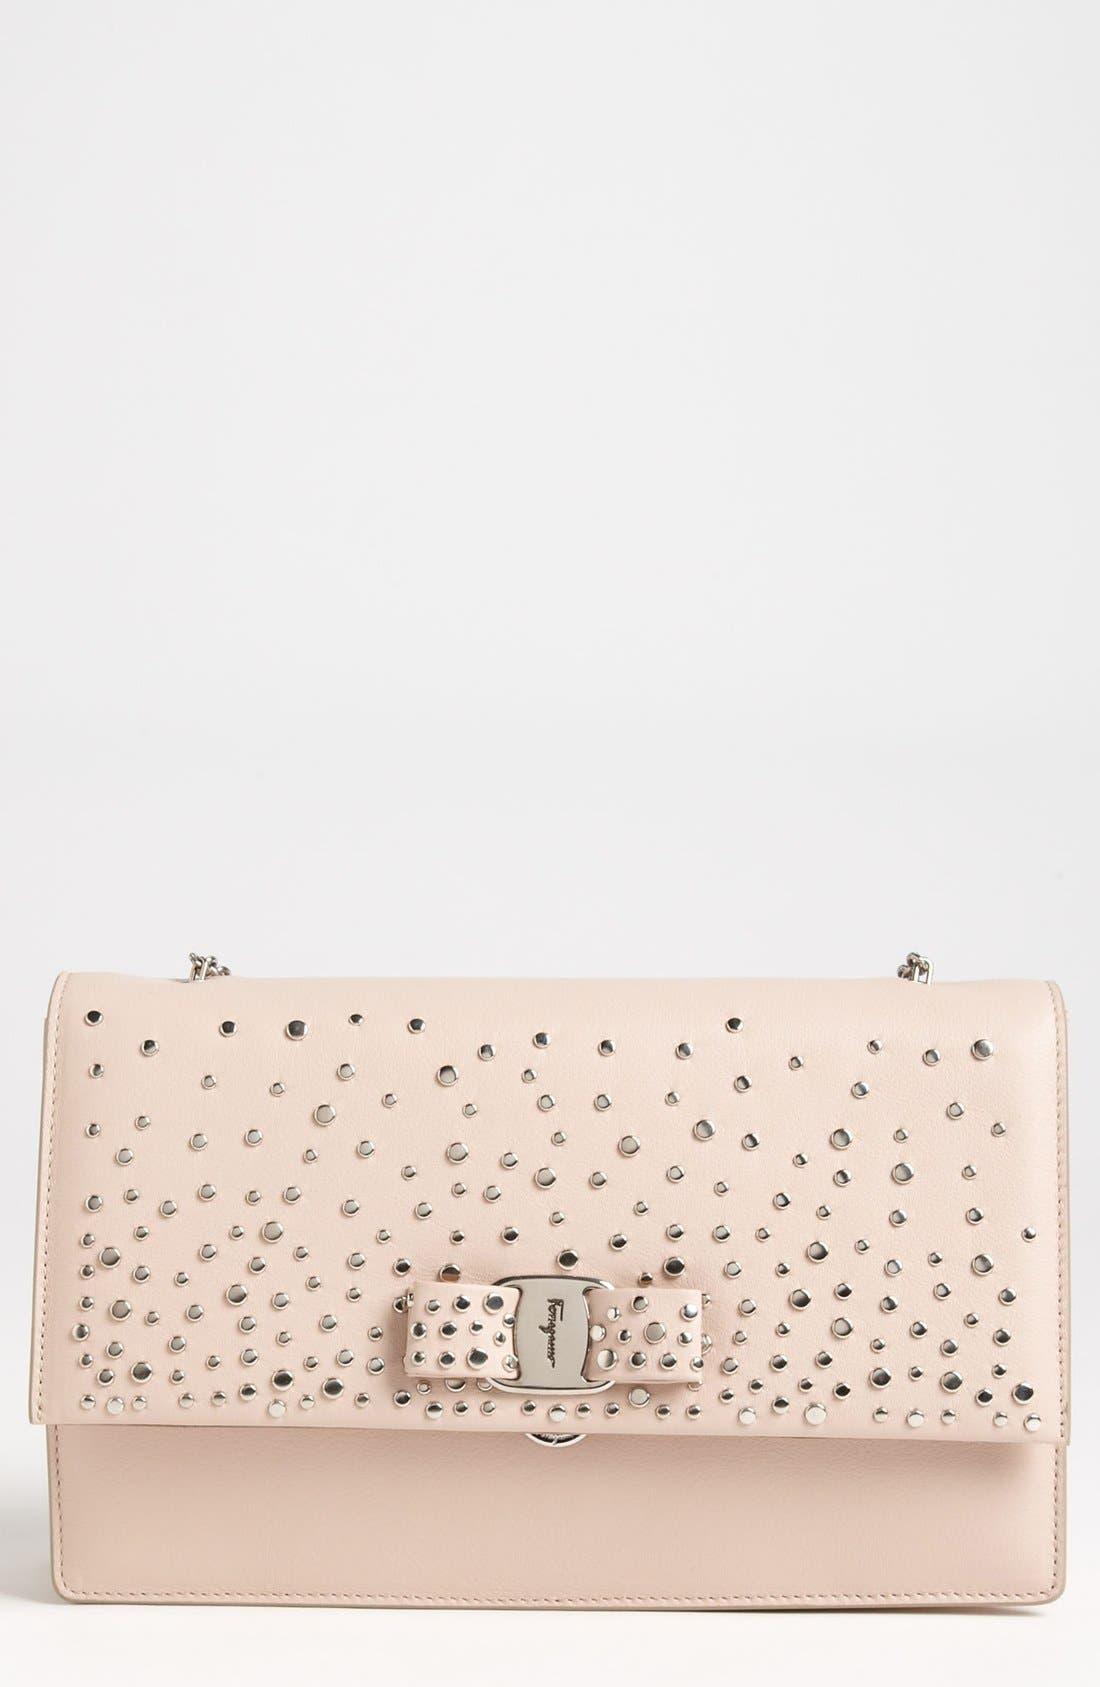 Alternate Image 1 Selected - Salvatore Ferragamo 'Louvre Ginny - Mini' Leather Shoulder Bag